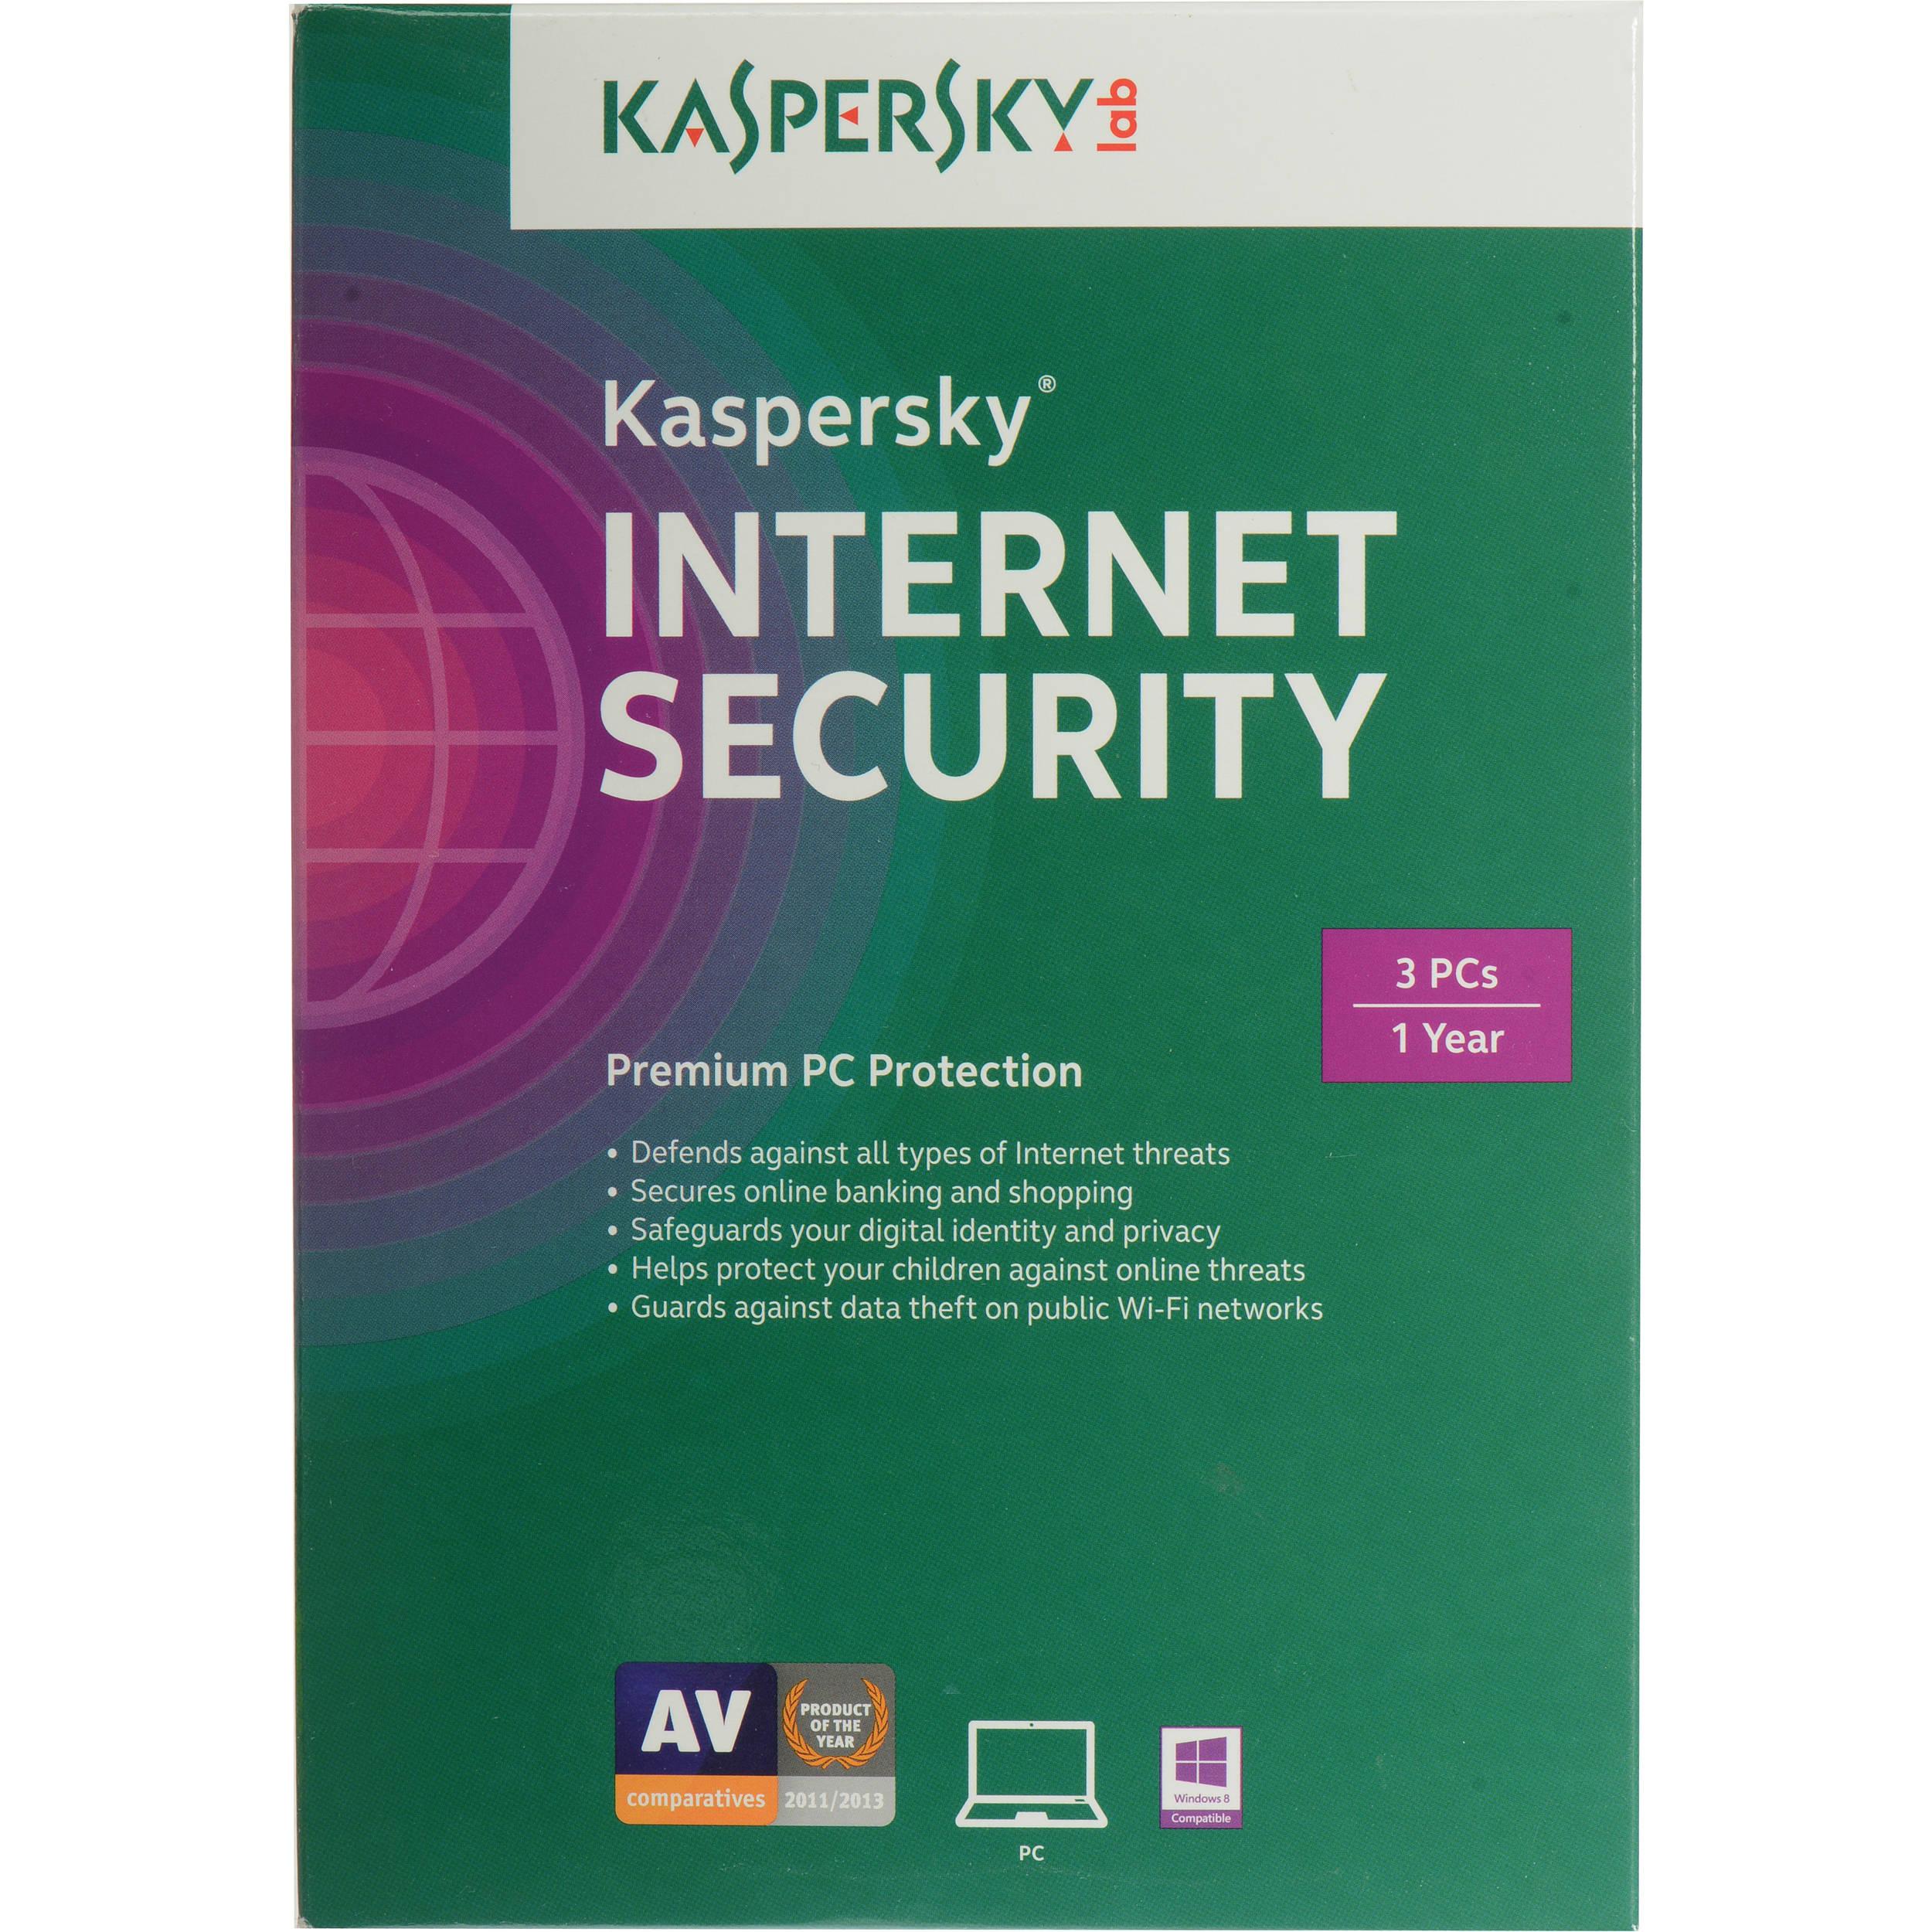 Kaspersky Kisuszz Kaspersky Internet